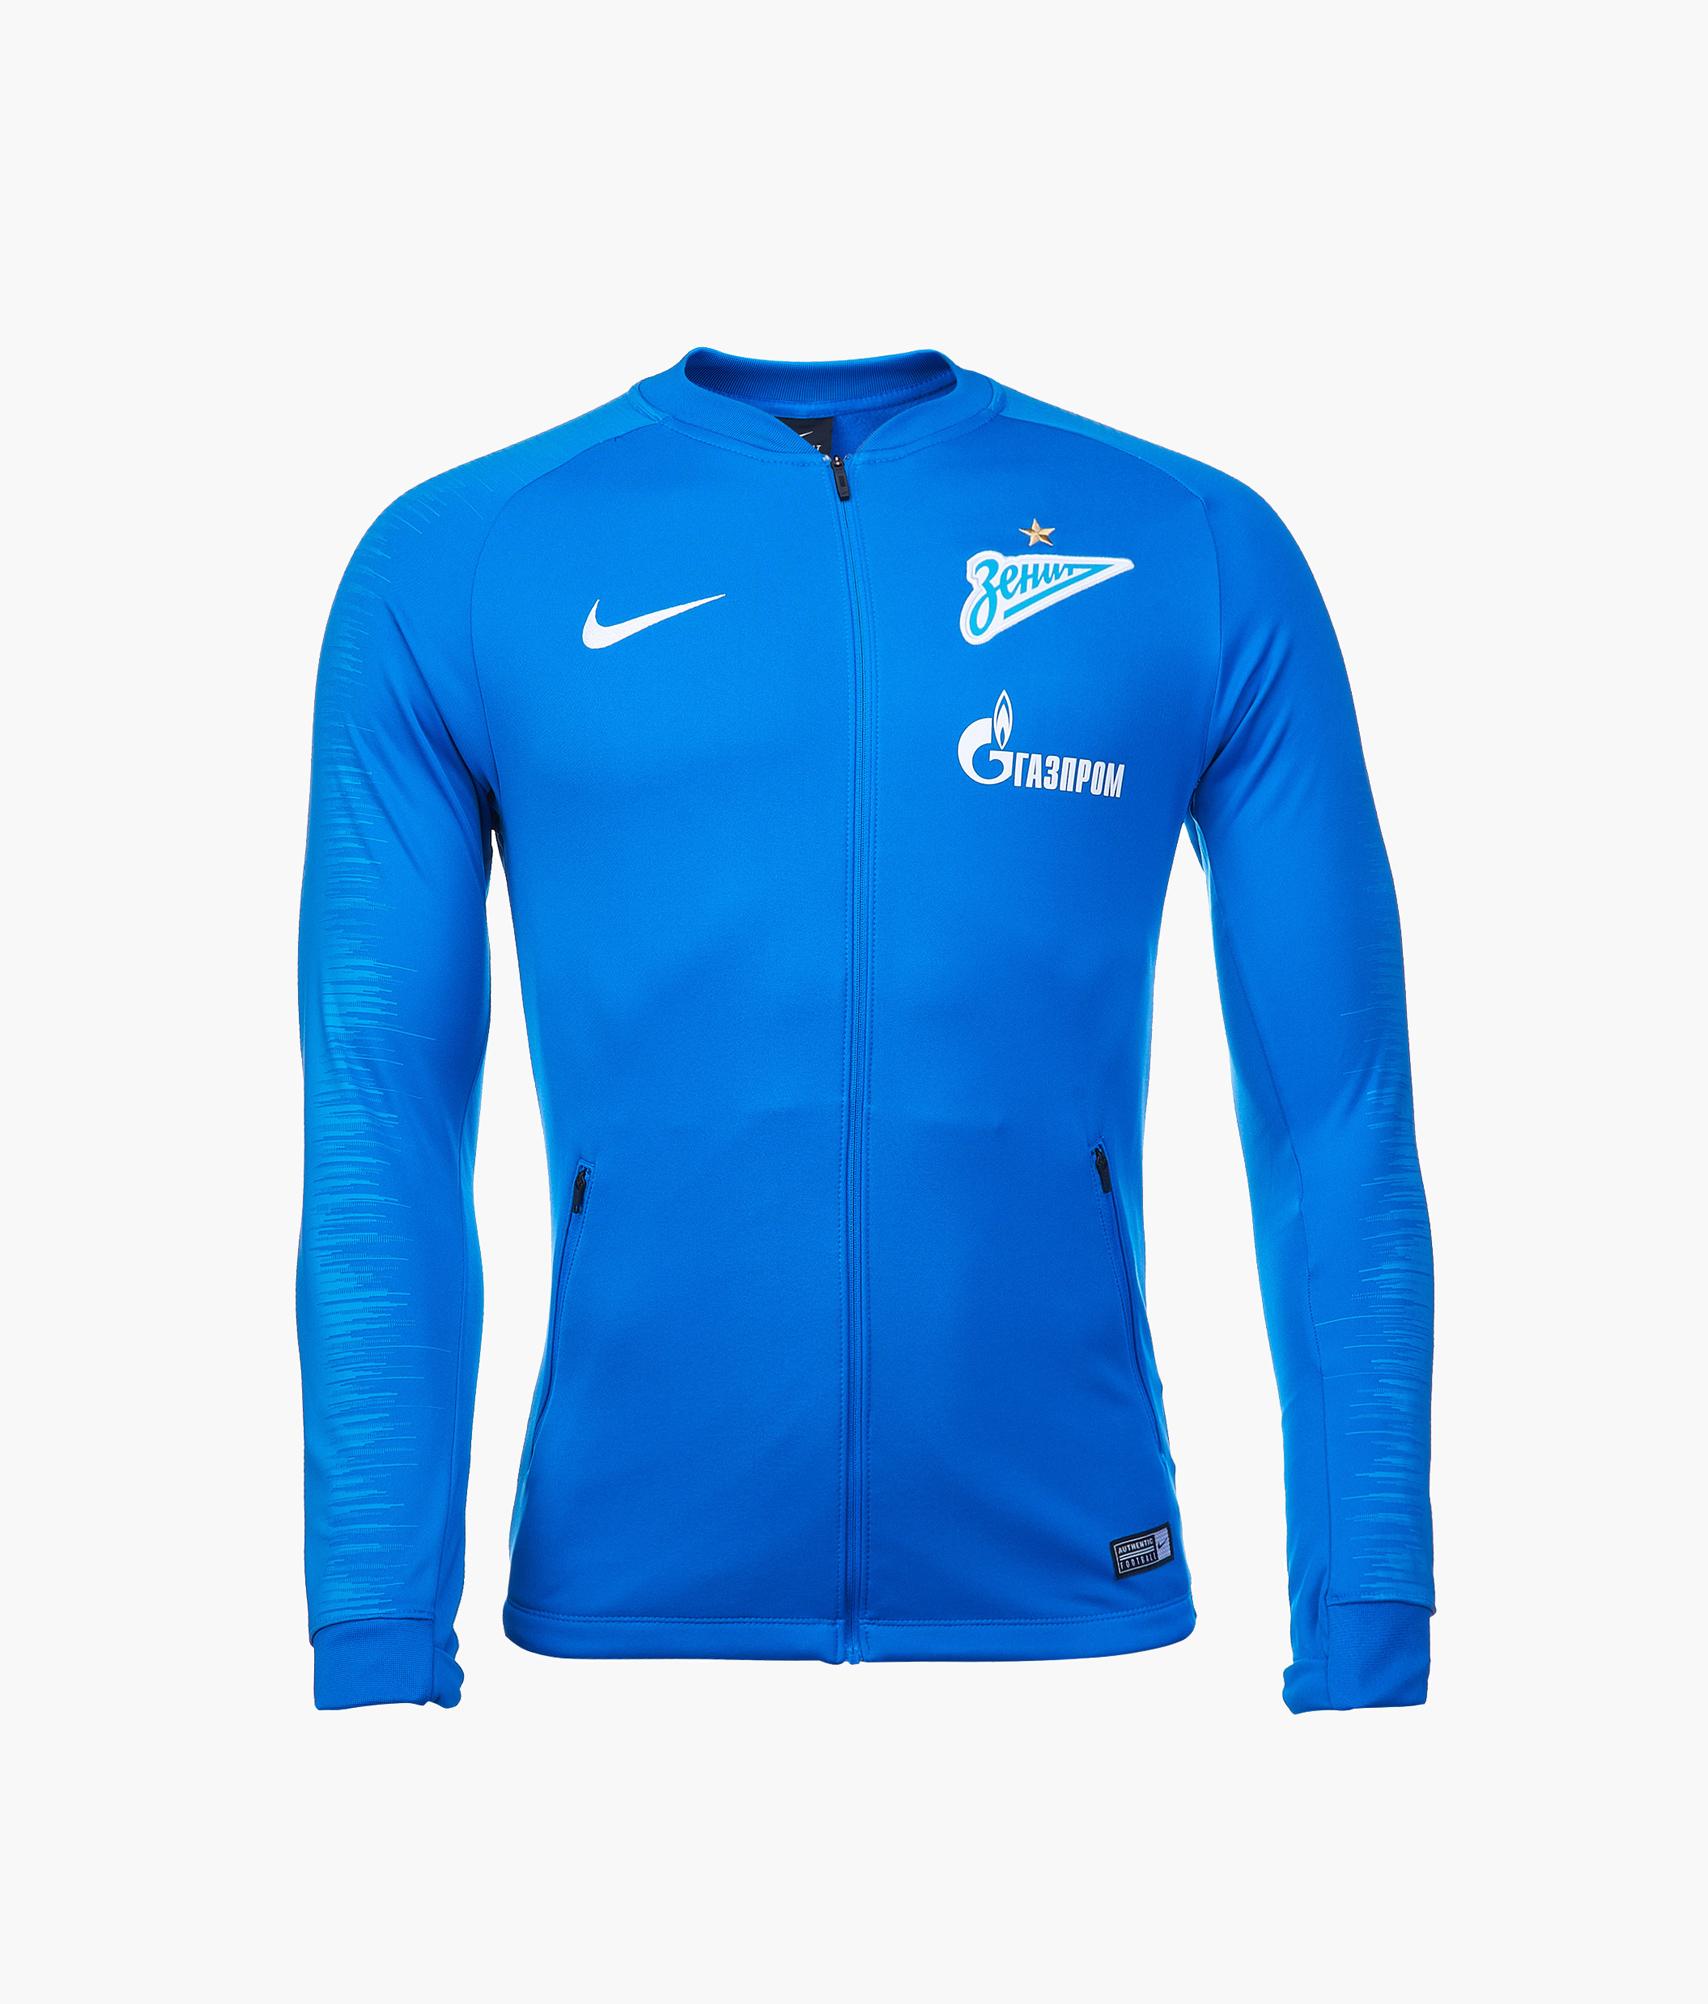 d9db5724 Олимпийка Nike Zenit сезона 2018/19 920067-466 купить за 5 999 руб в  интернет магазине ФК Зенит